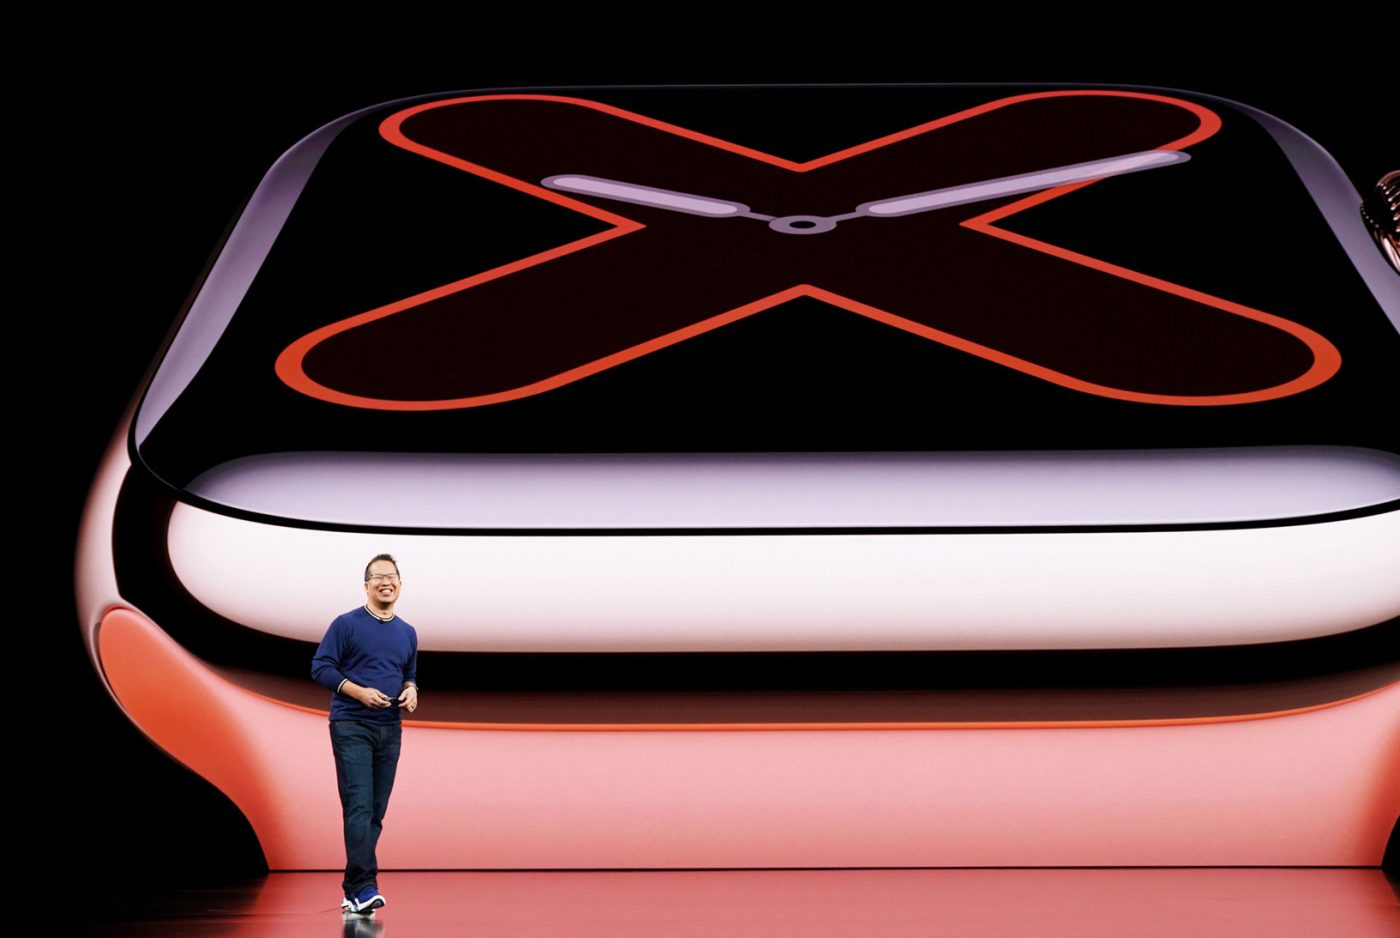 Apple Watch Series 5 announcement keynote